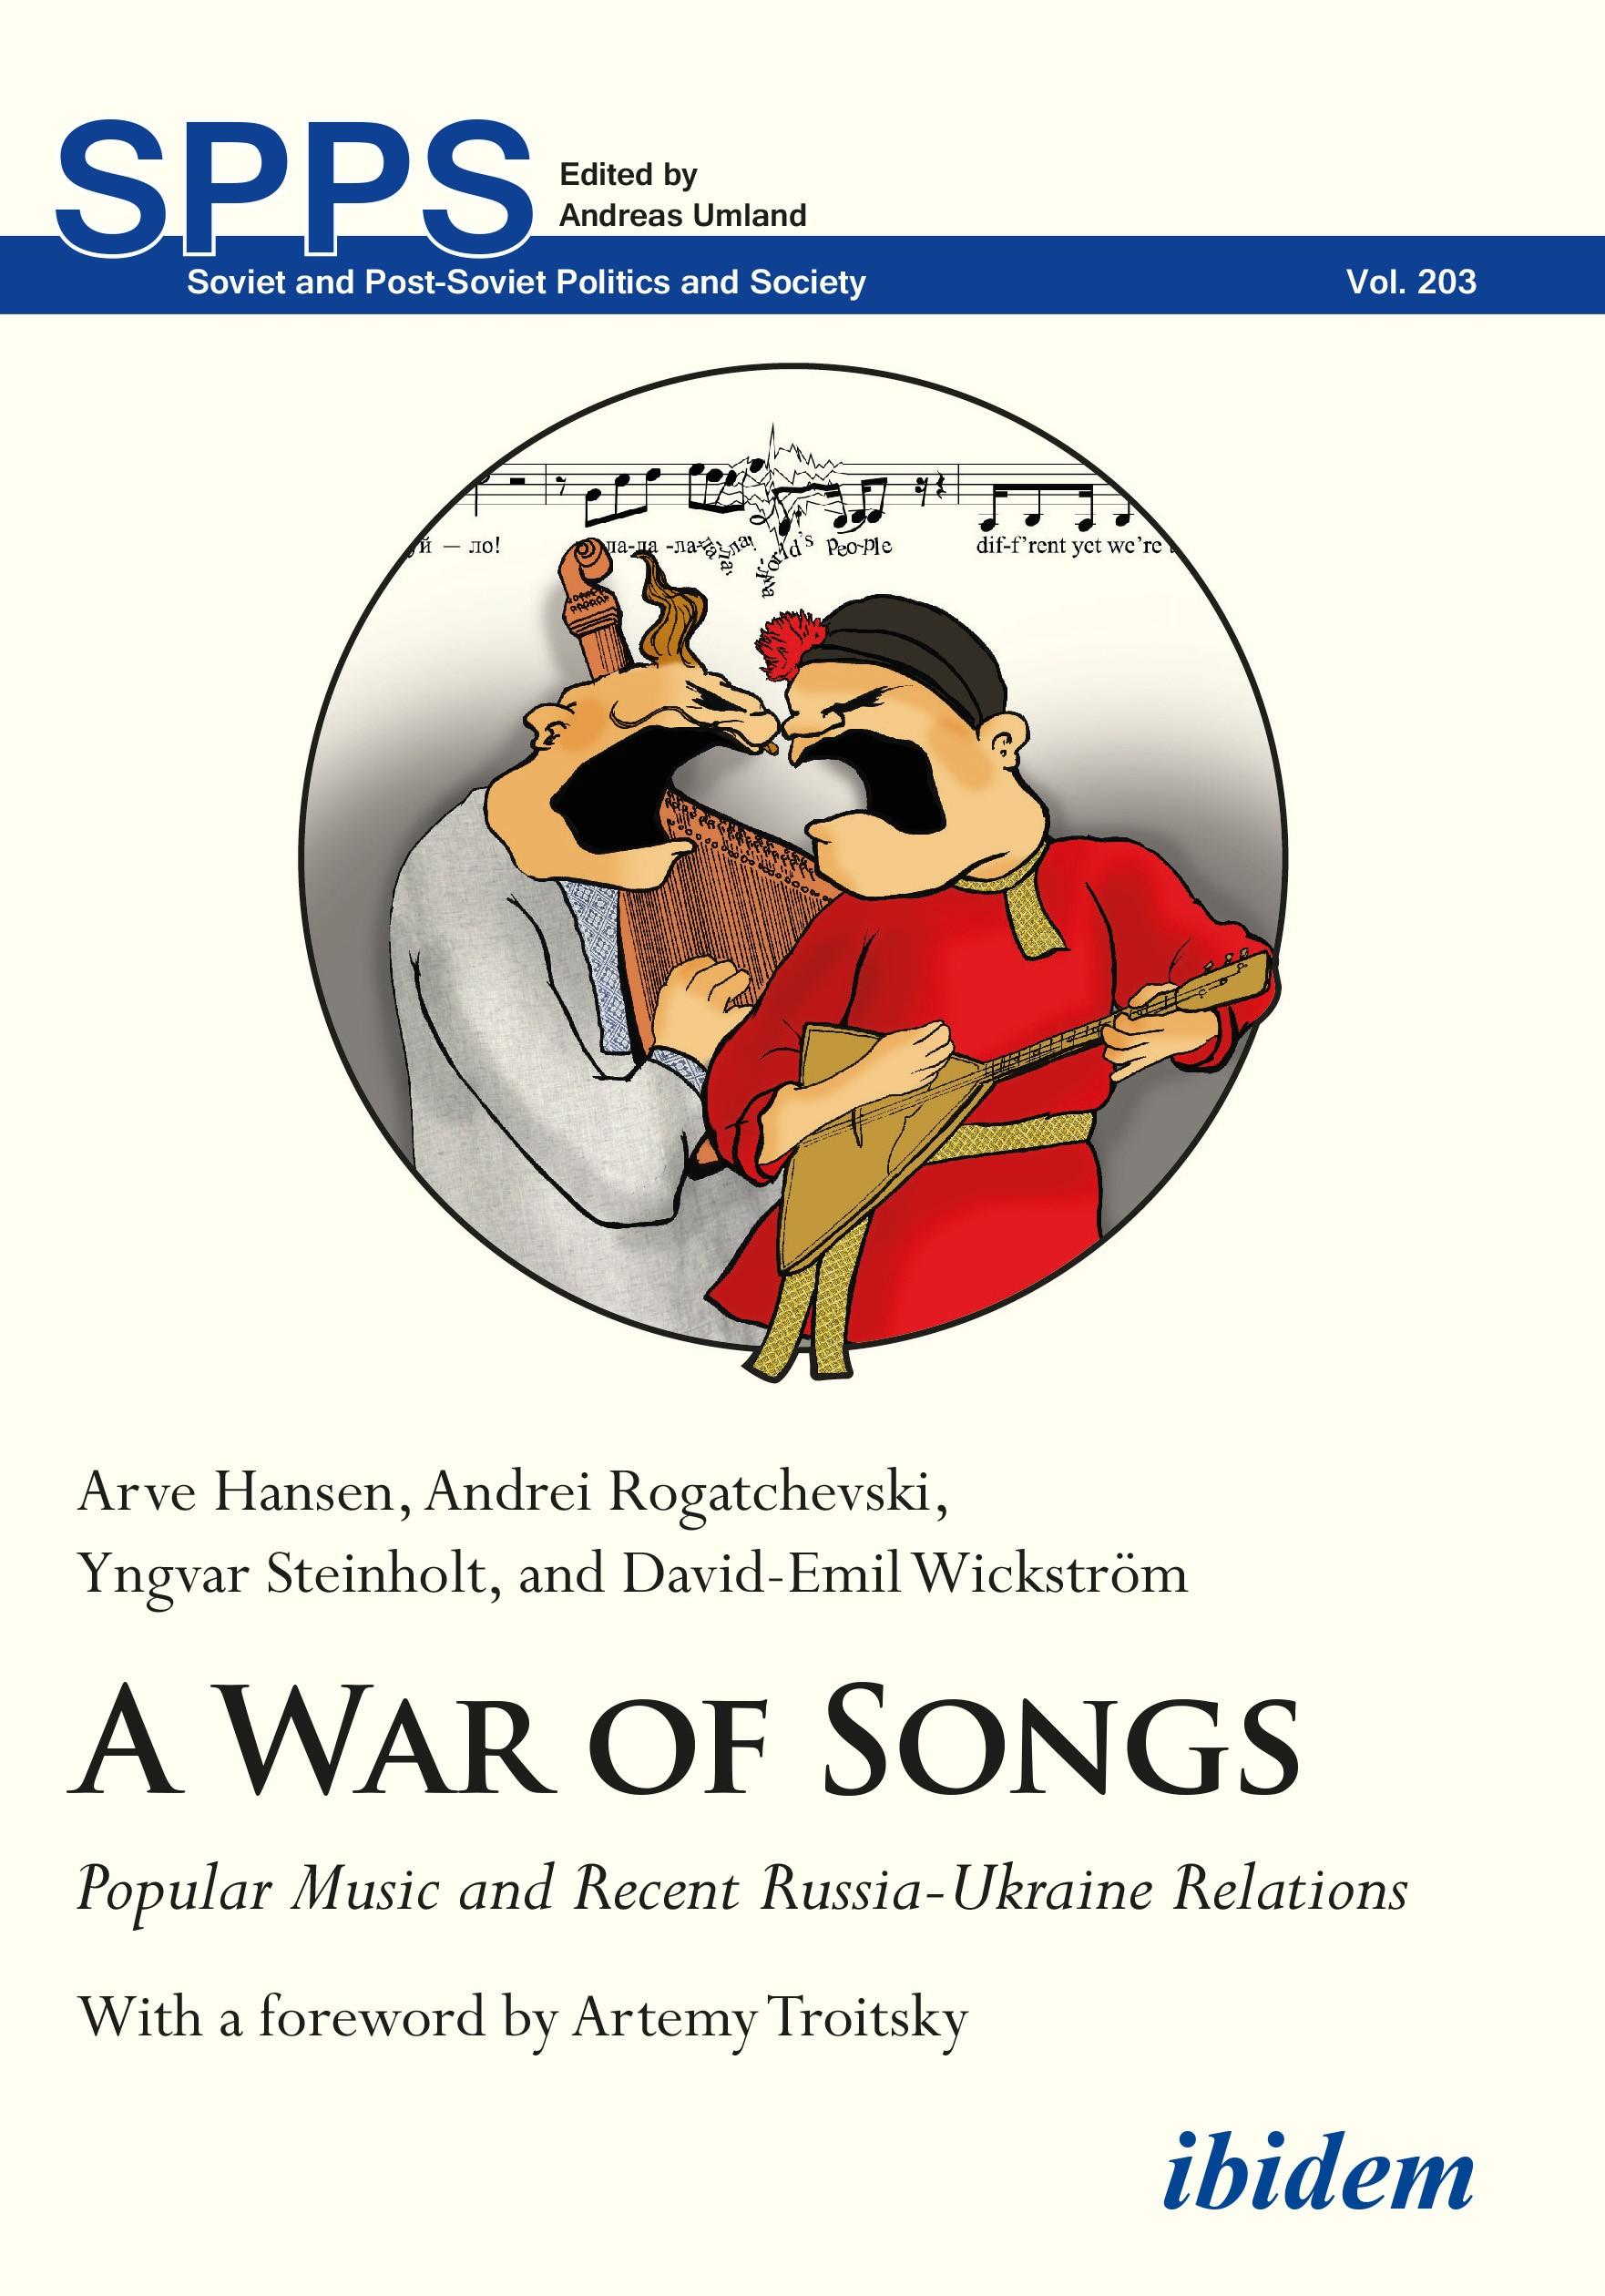 War of Songs